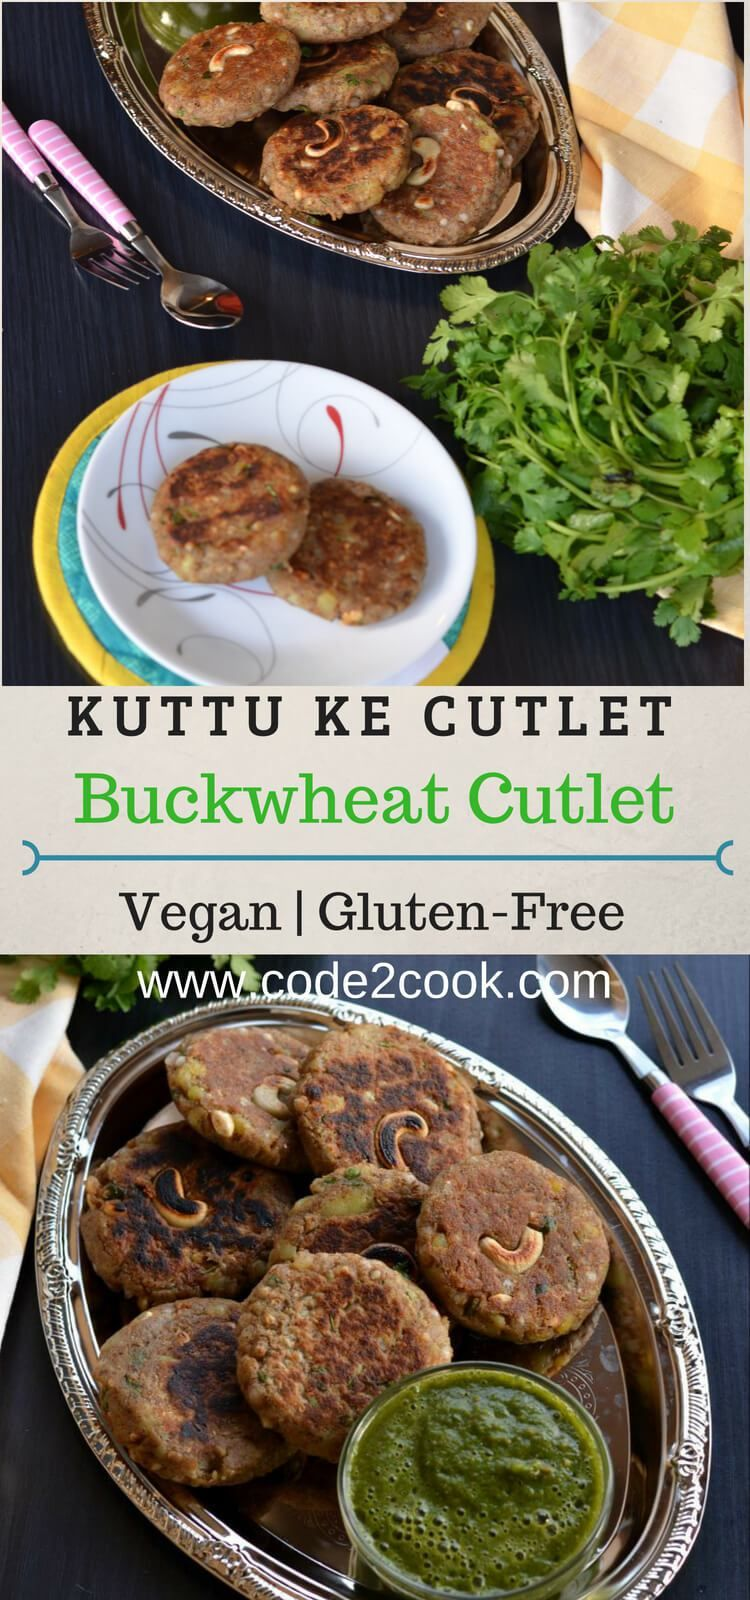 Kuttu Ki Tikki Buckwheat Cutlet Recipe Buckwheat